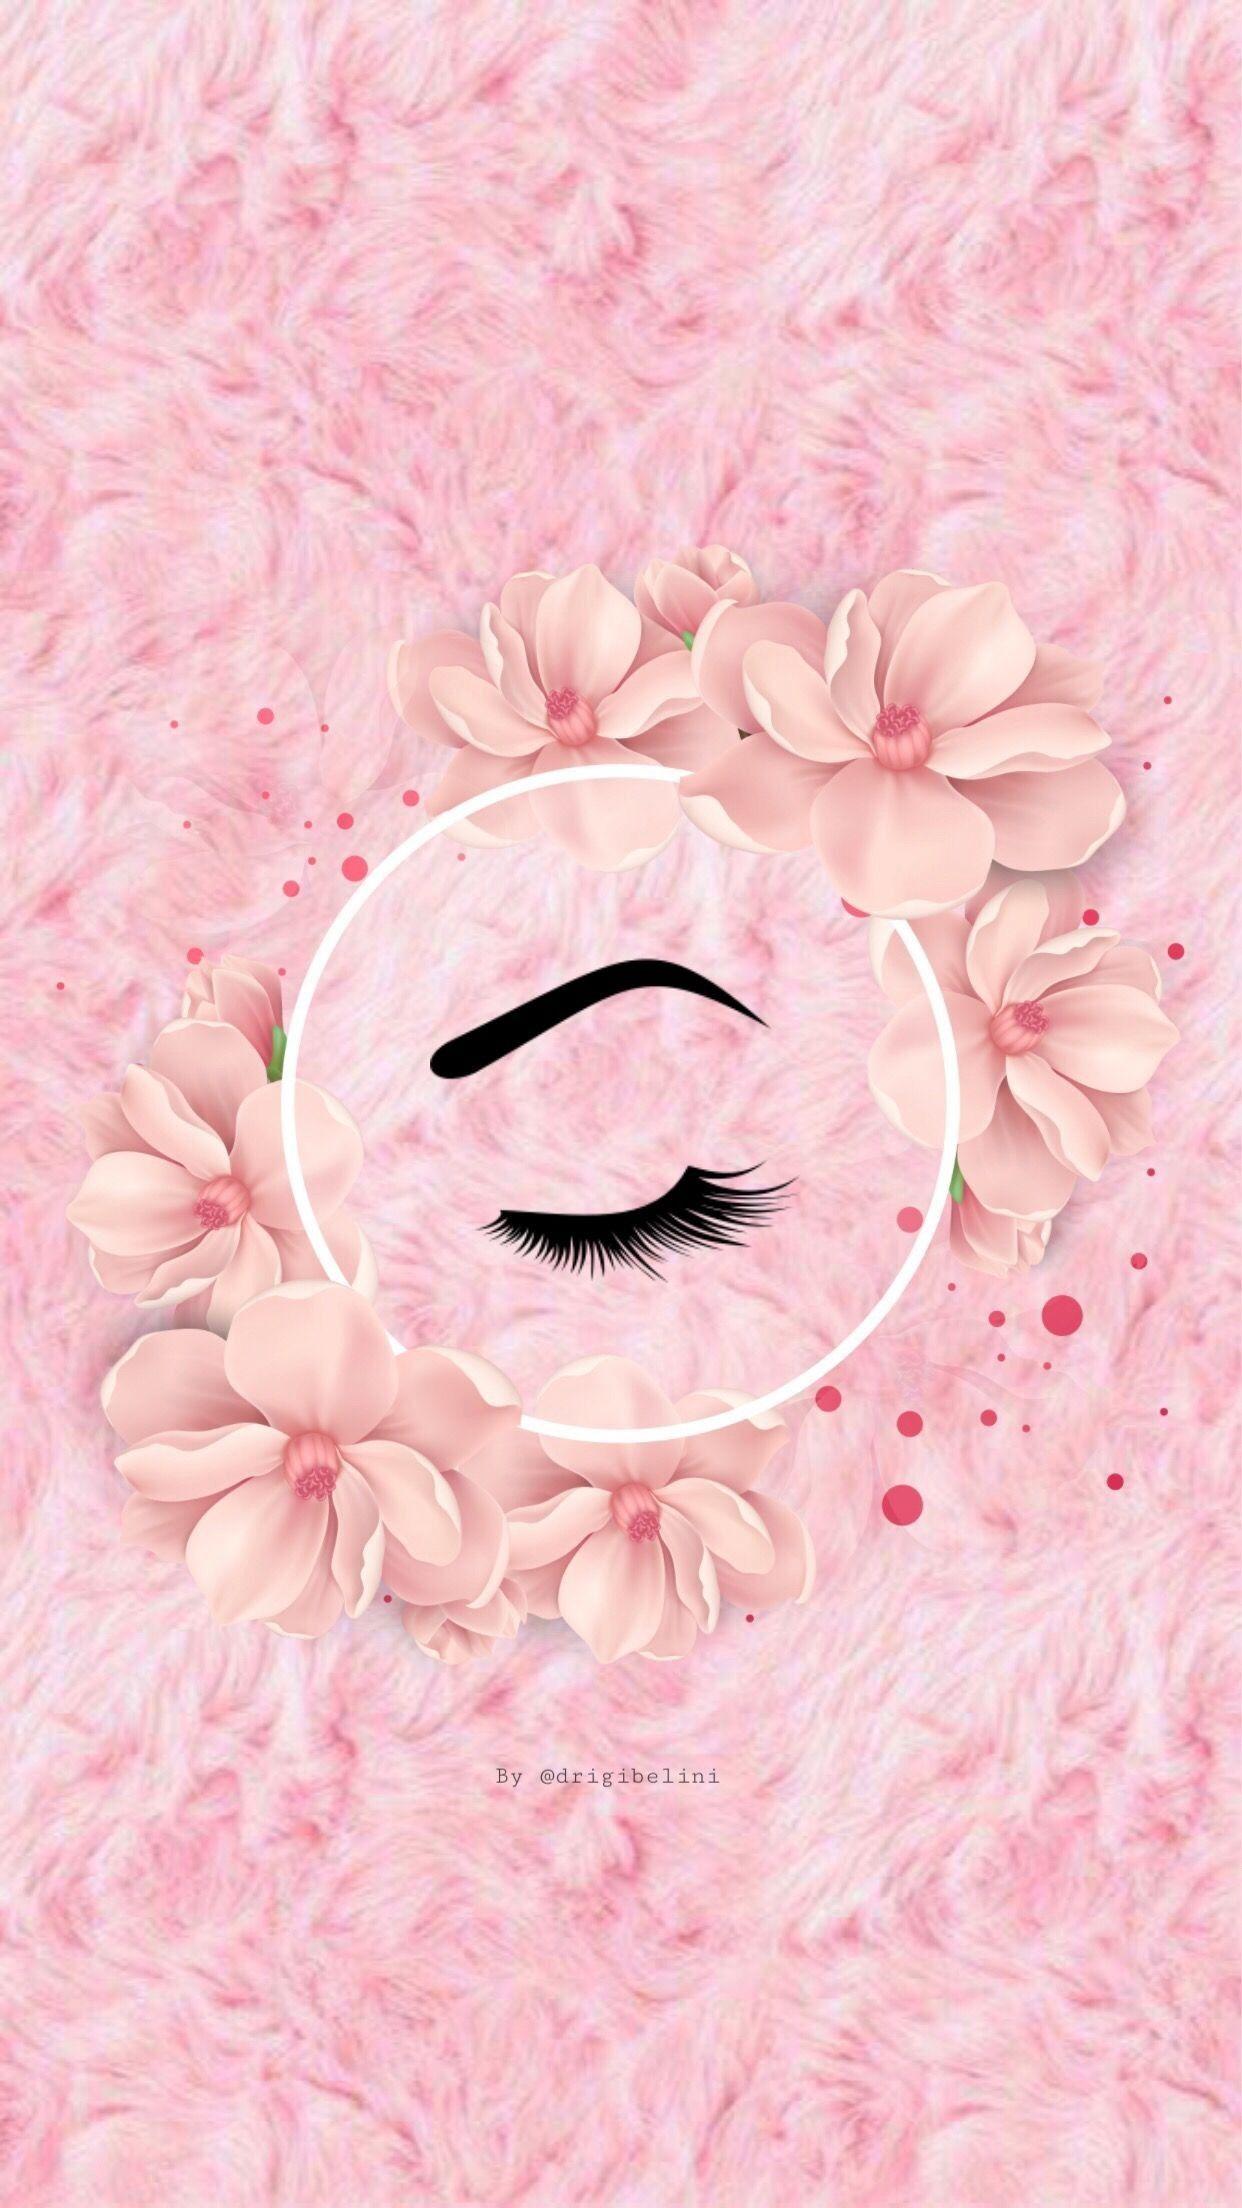 create your own brand creme eyelashes wholesale 100% 3d real siberian mink fur eyelashes | CHARMING BAY LASHES